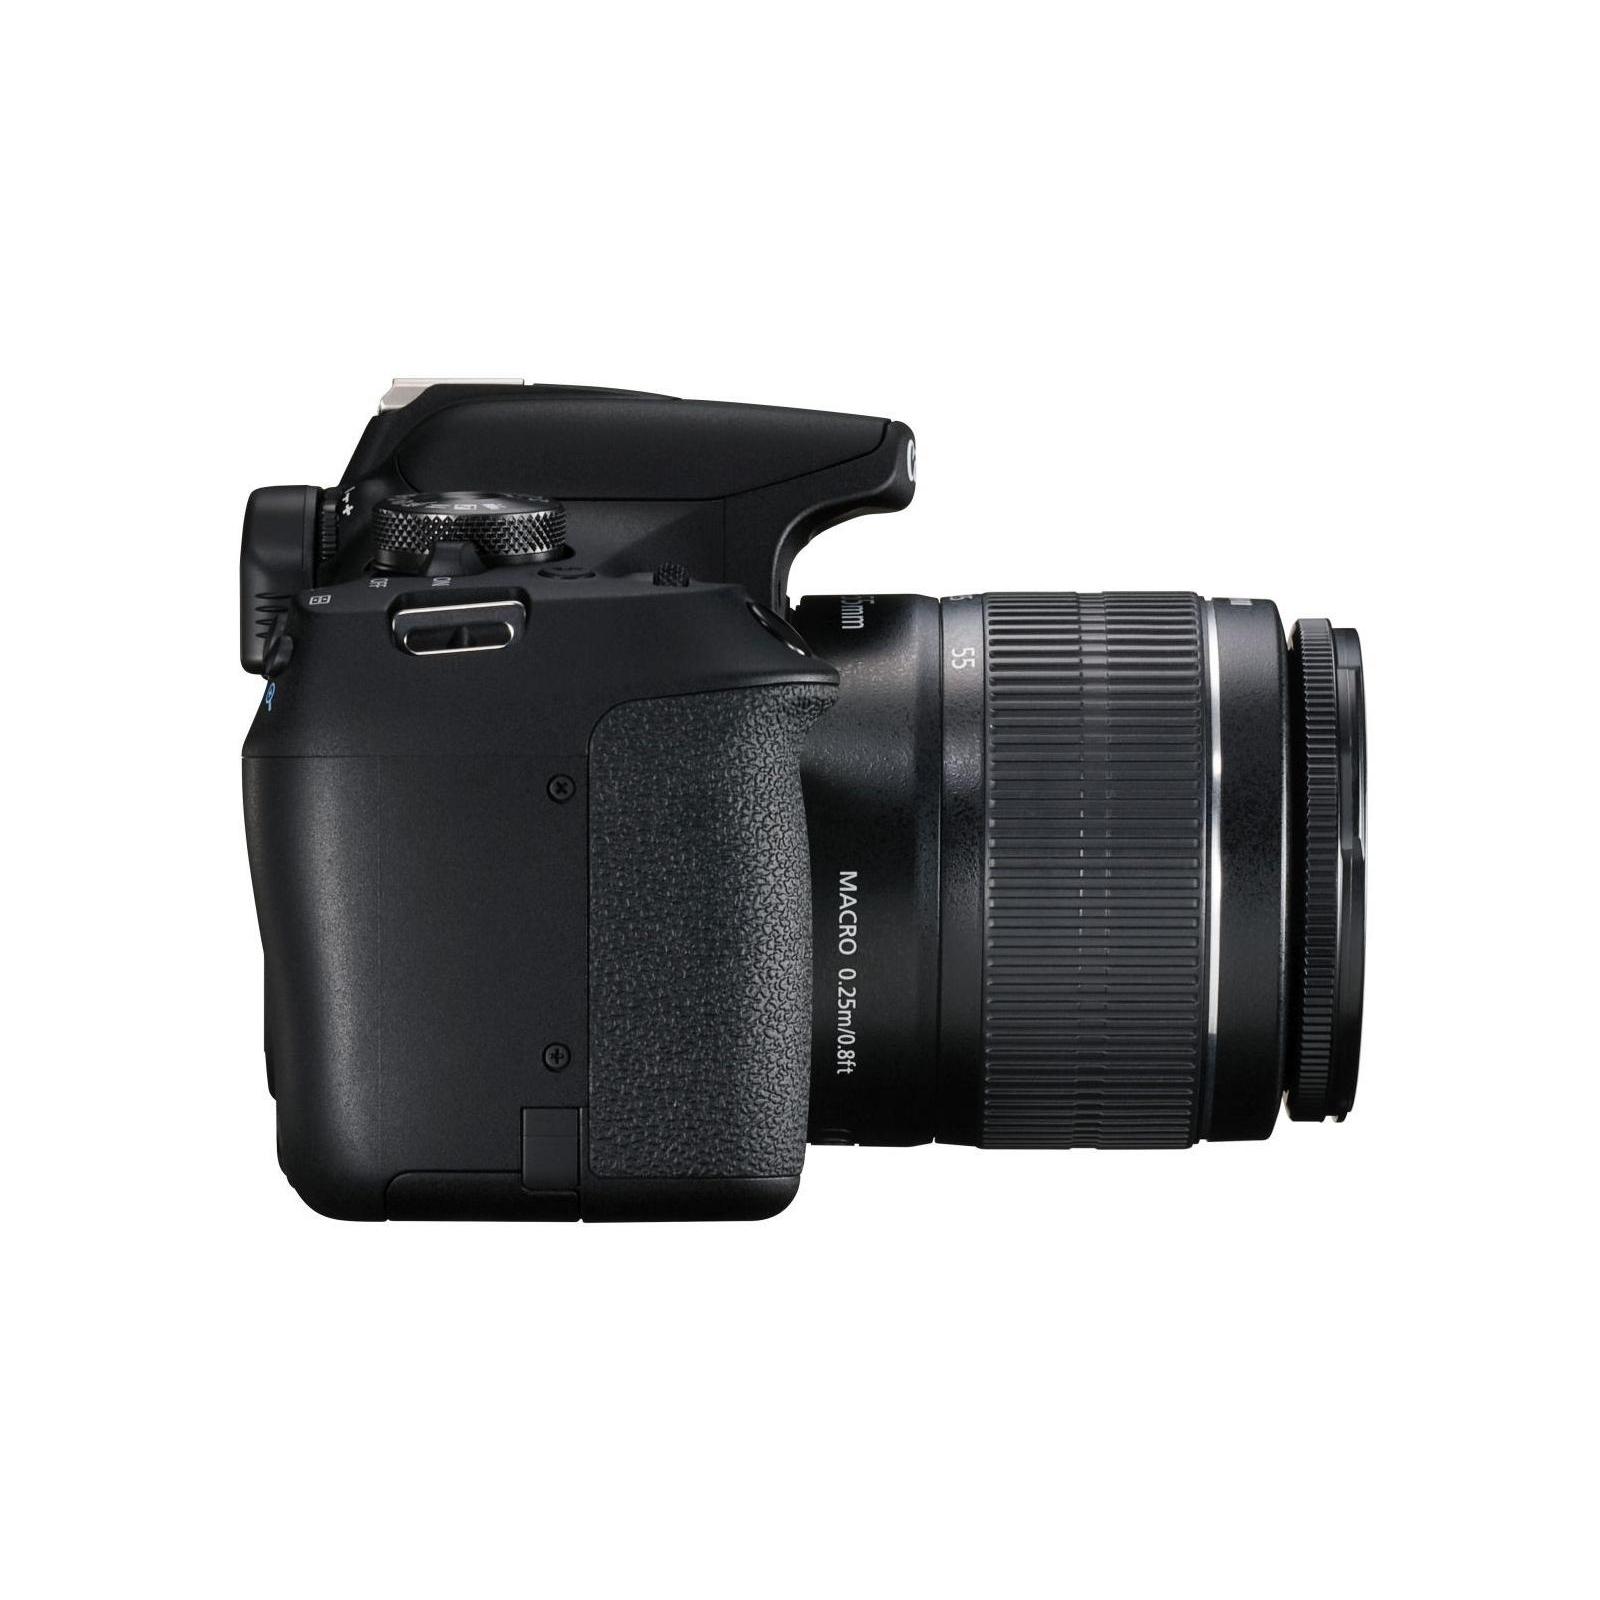 Цифровой фотоаппарат Canon EOS 2000D 18-55 IS II kit (2728C008) изображение 6